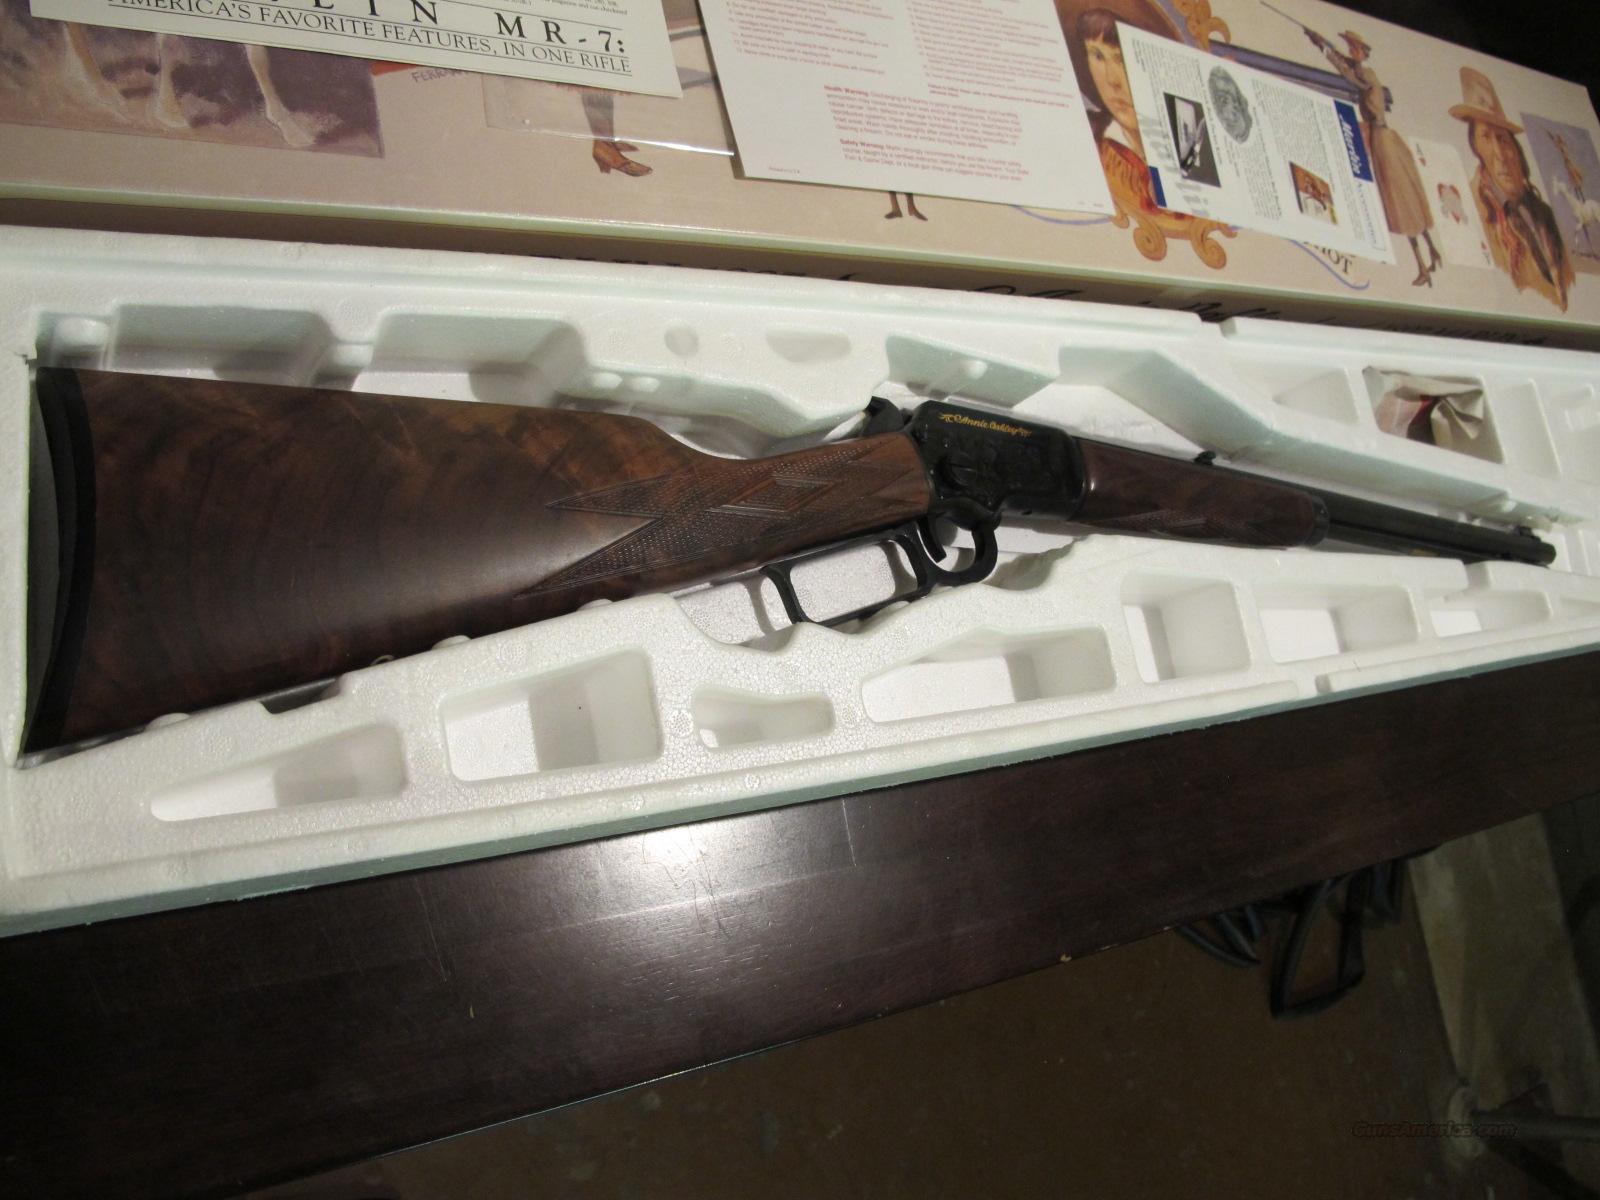 Marlin Rifle 22 Cal  Model 39a Golden Annie Oakley Edition